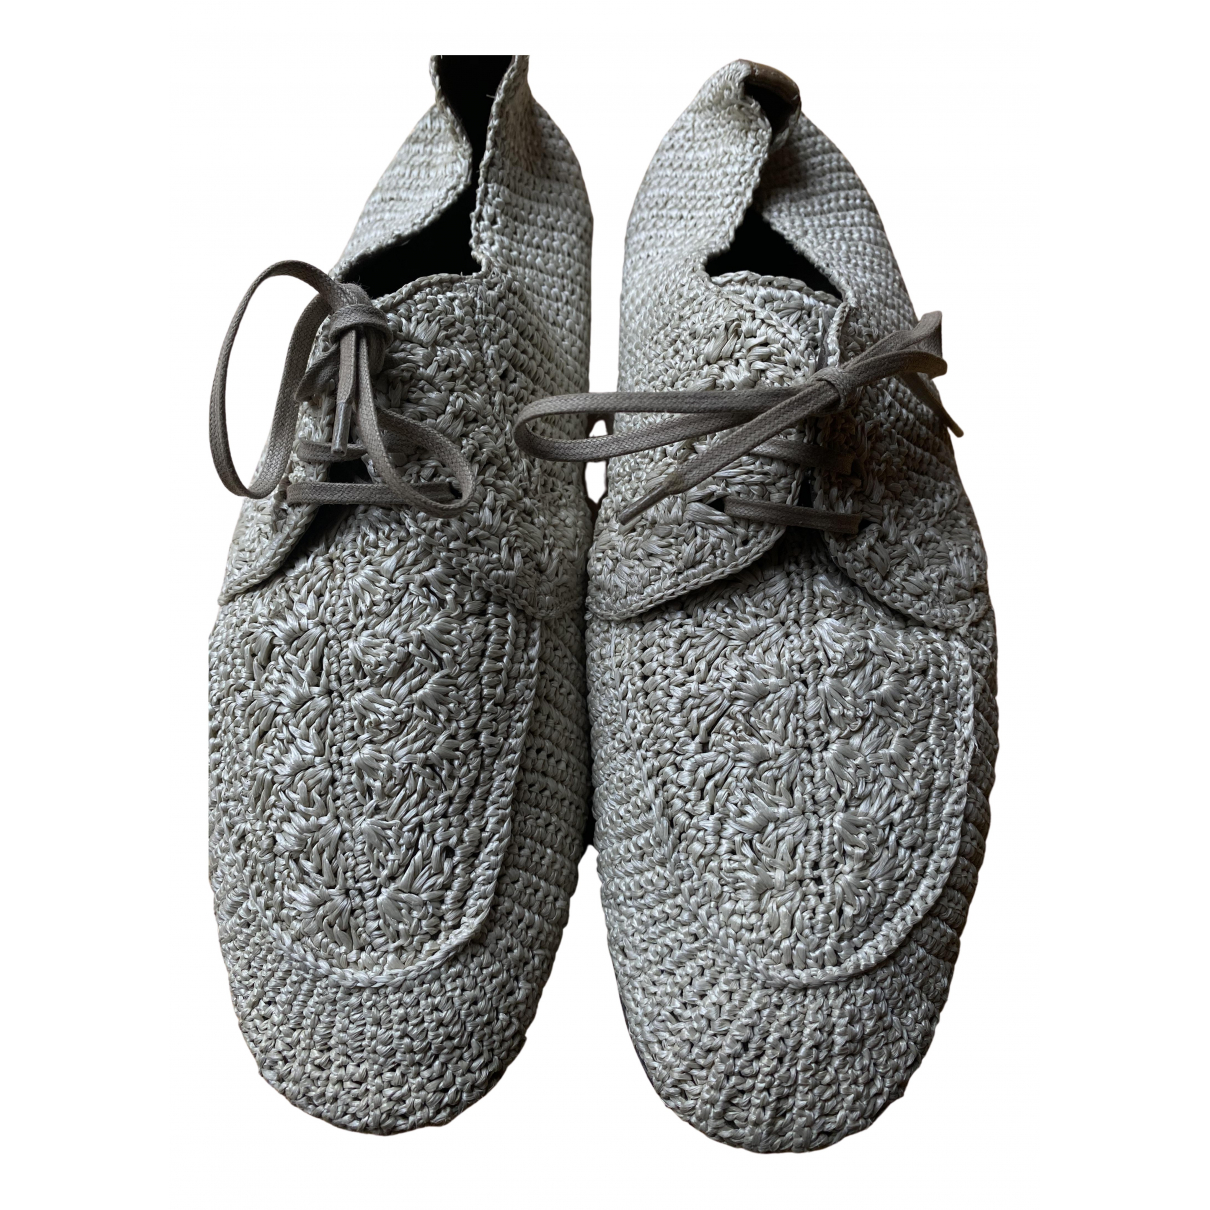 Dolce & Gabbana \N Schnuerschuhe in  Khaki Leder